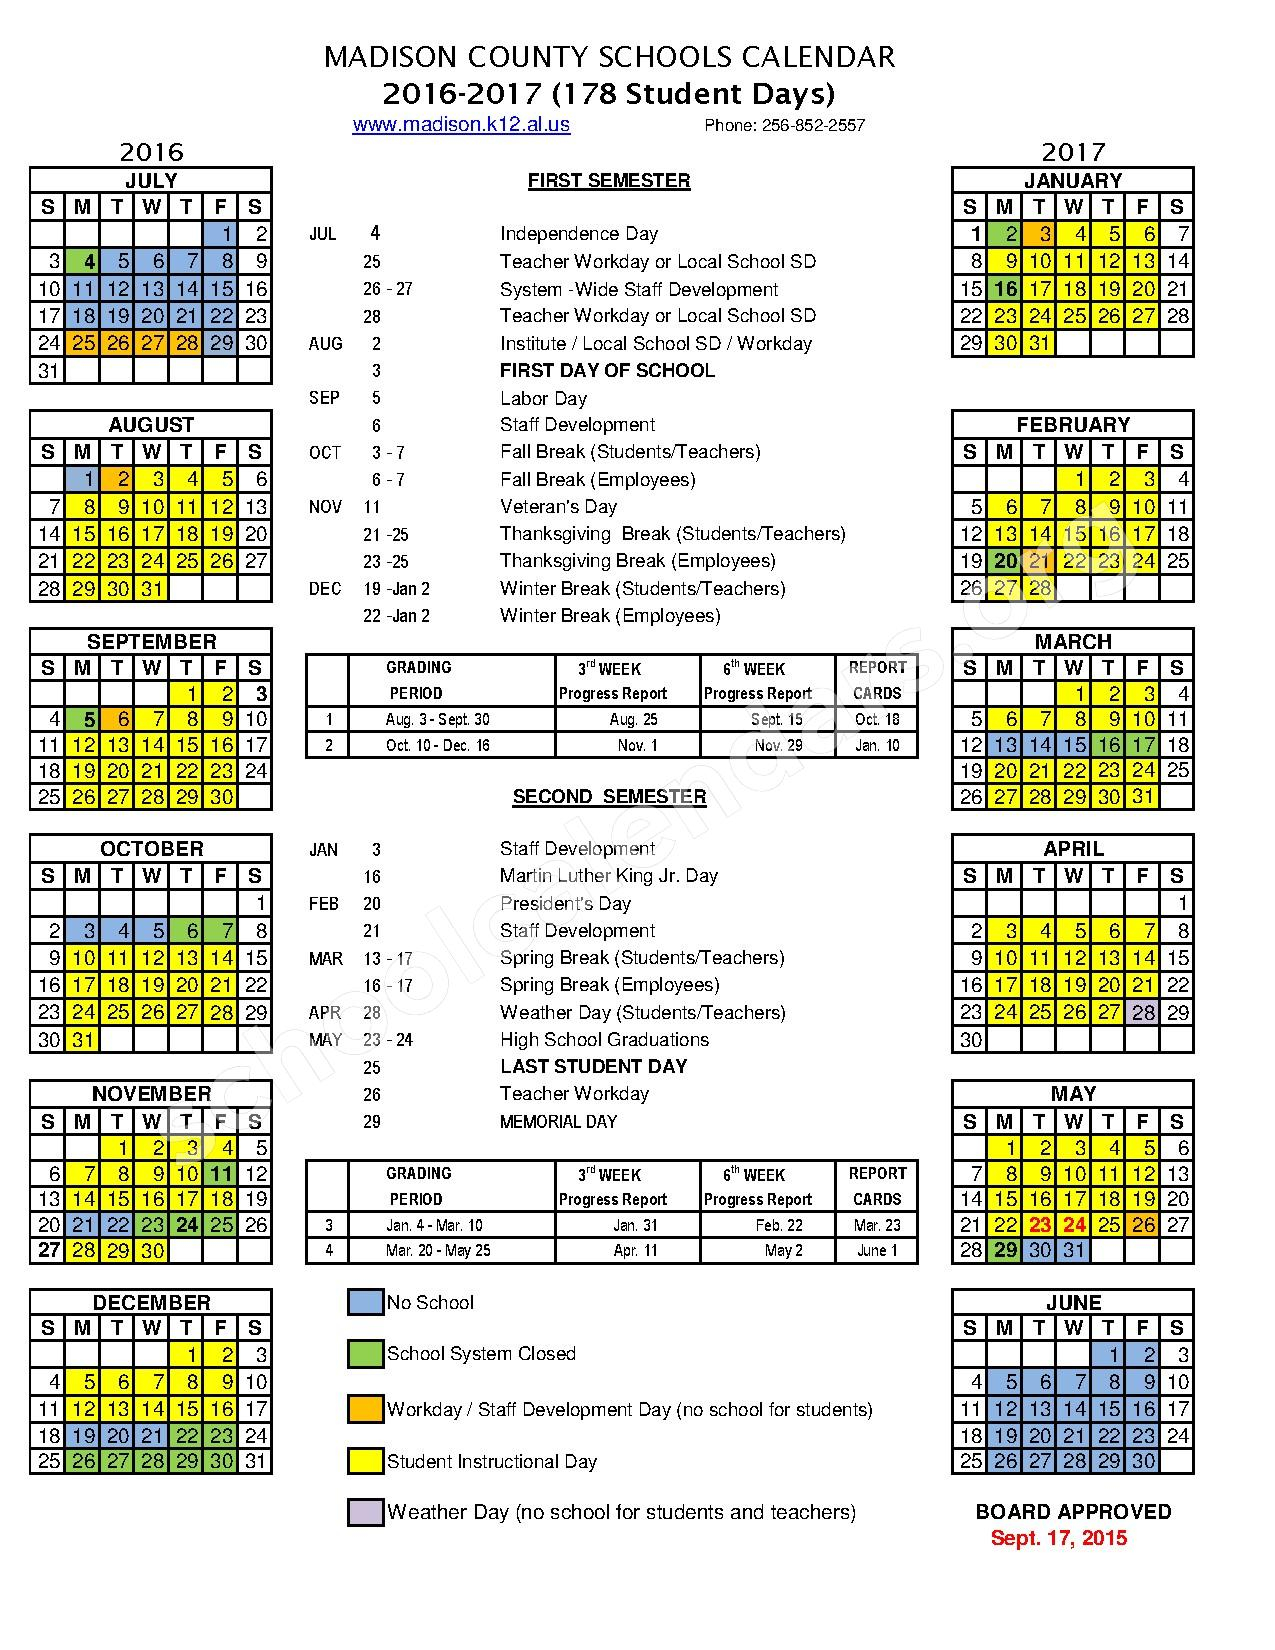 2016 - 2017 School Calendar | Madison County Schools Within Madison County Schools School Year Calendar